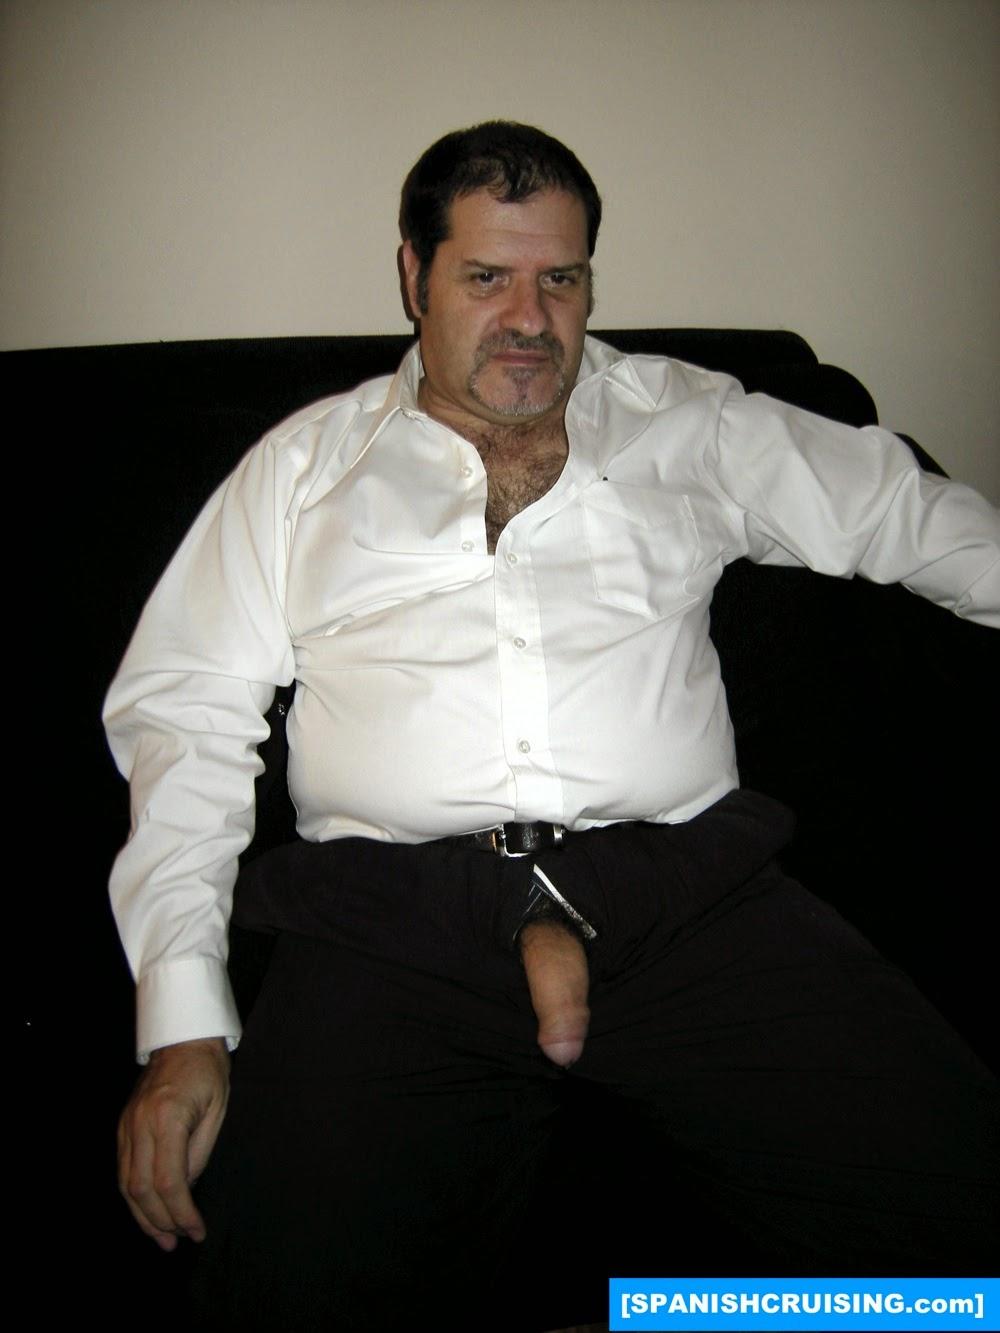 Dick fancis award